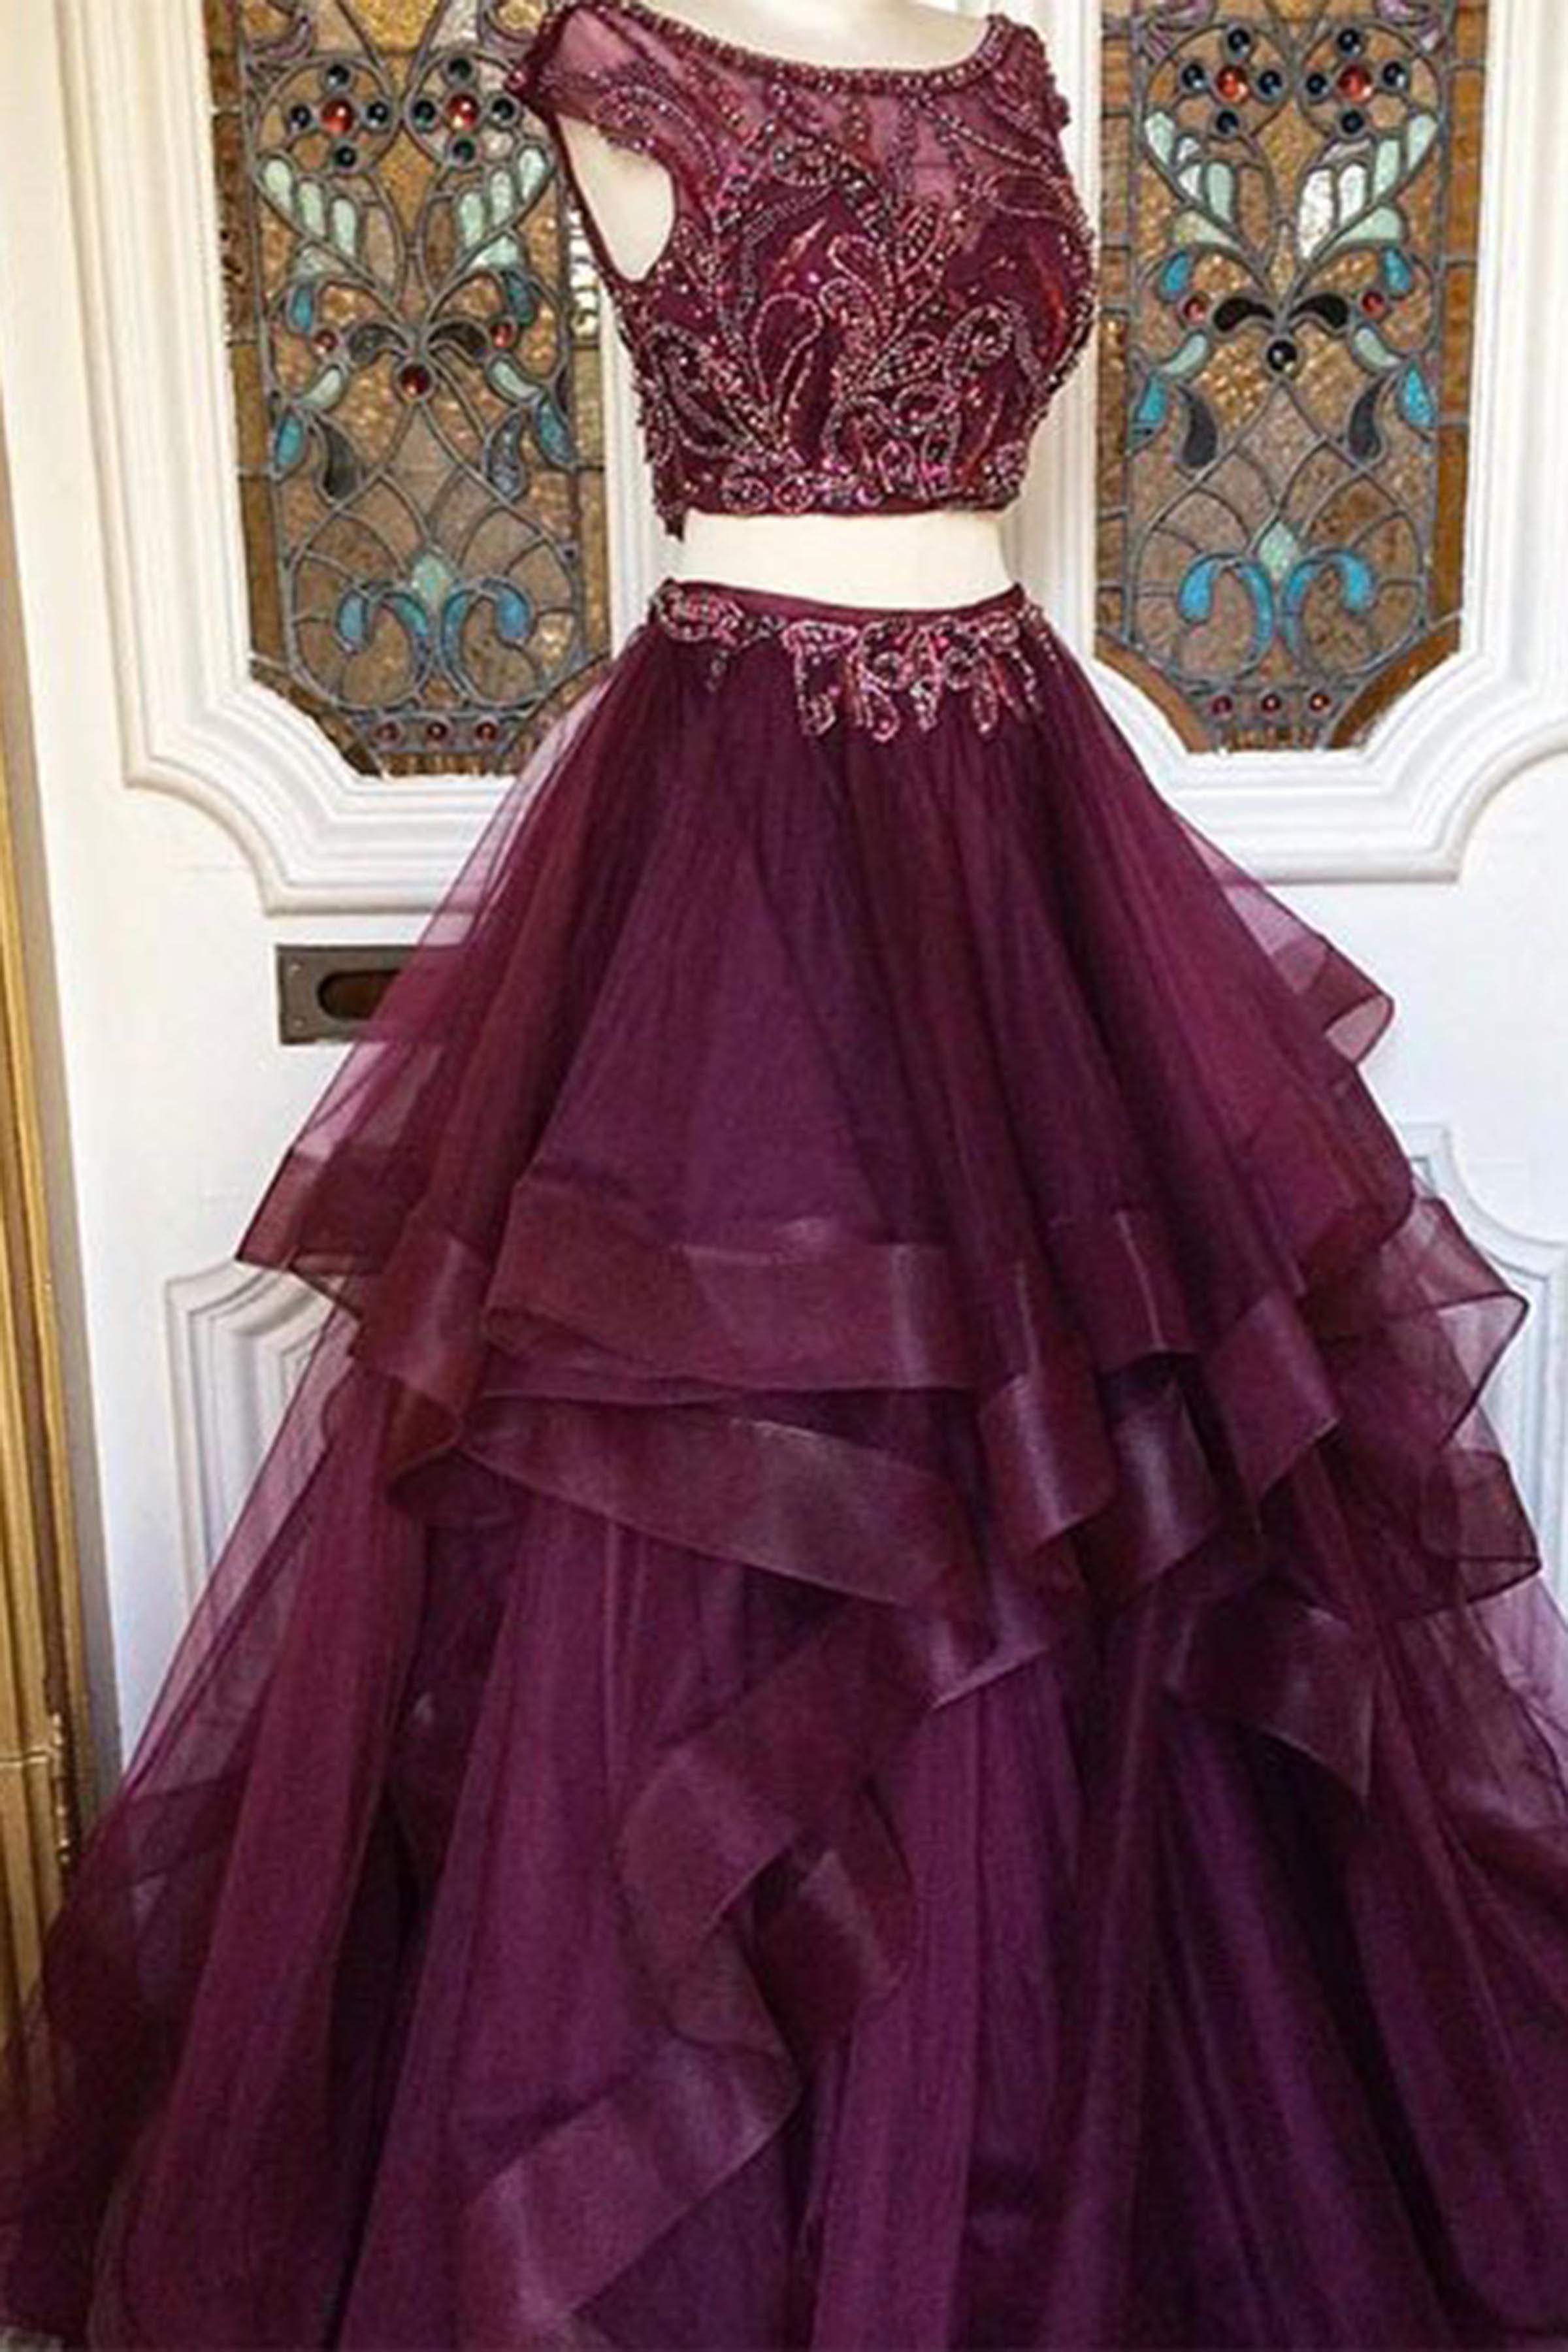 Burgundy Organza Prom Dress Two Piece Dress Prom Dresses For Teens Elegant Prom Dresses Evening Dresses Prom Cheap Prom Dresses Long [ 3600 x 2400 Pixel ]